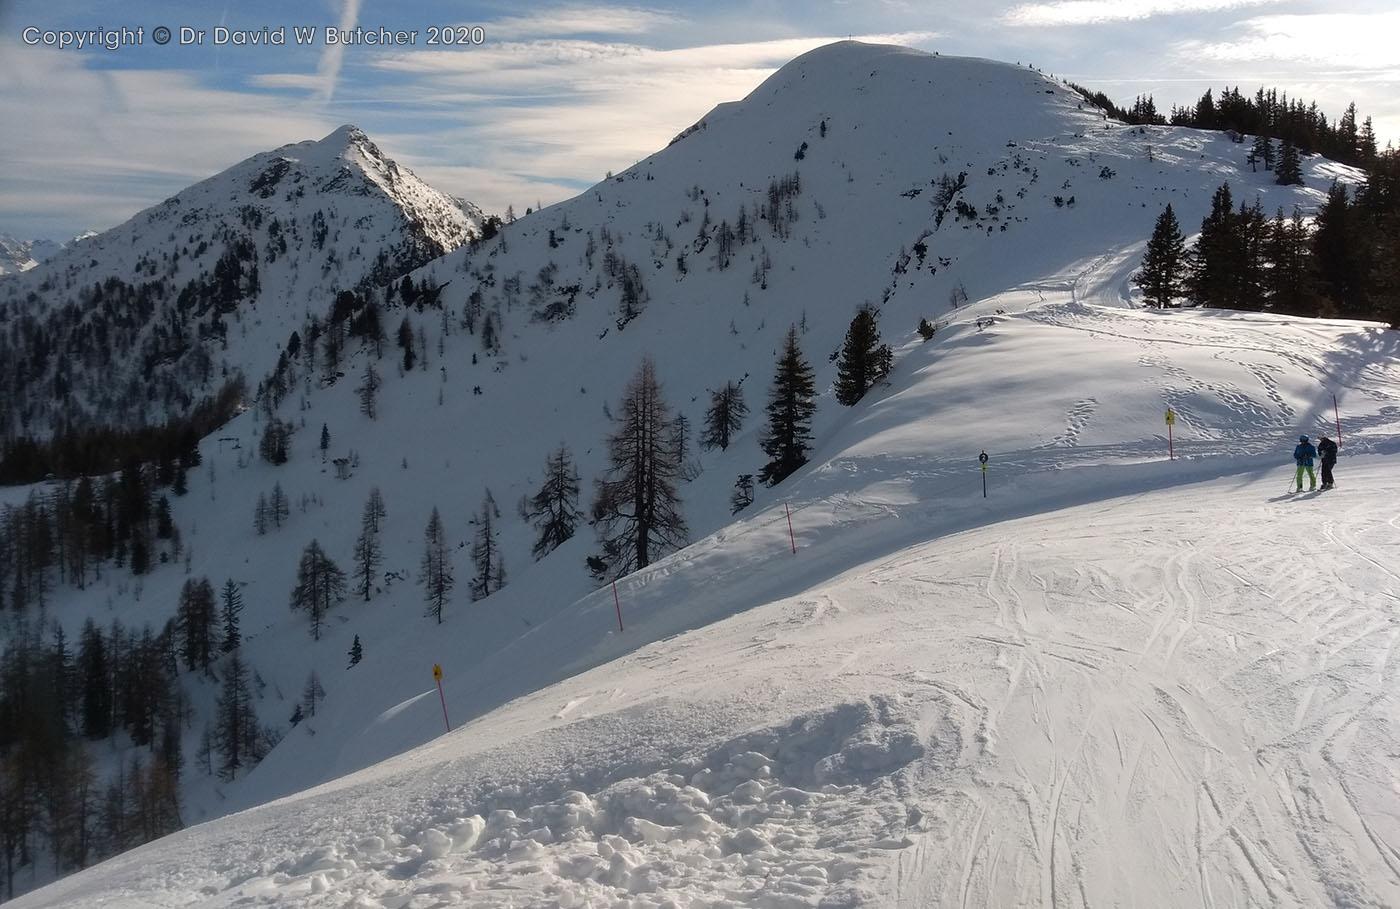 Schladming Reiteralm Bergstation Black Rose Ski Run